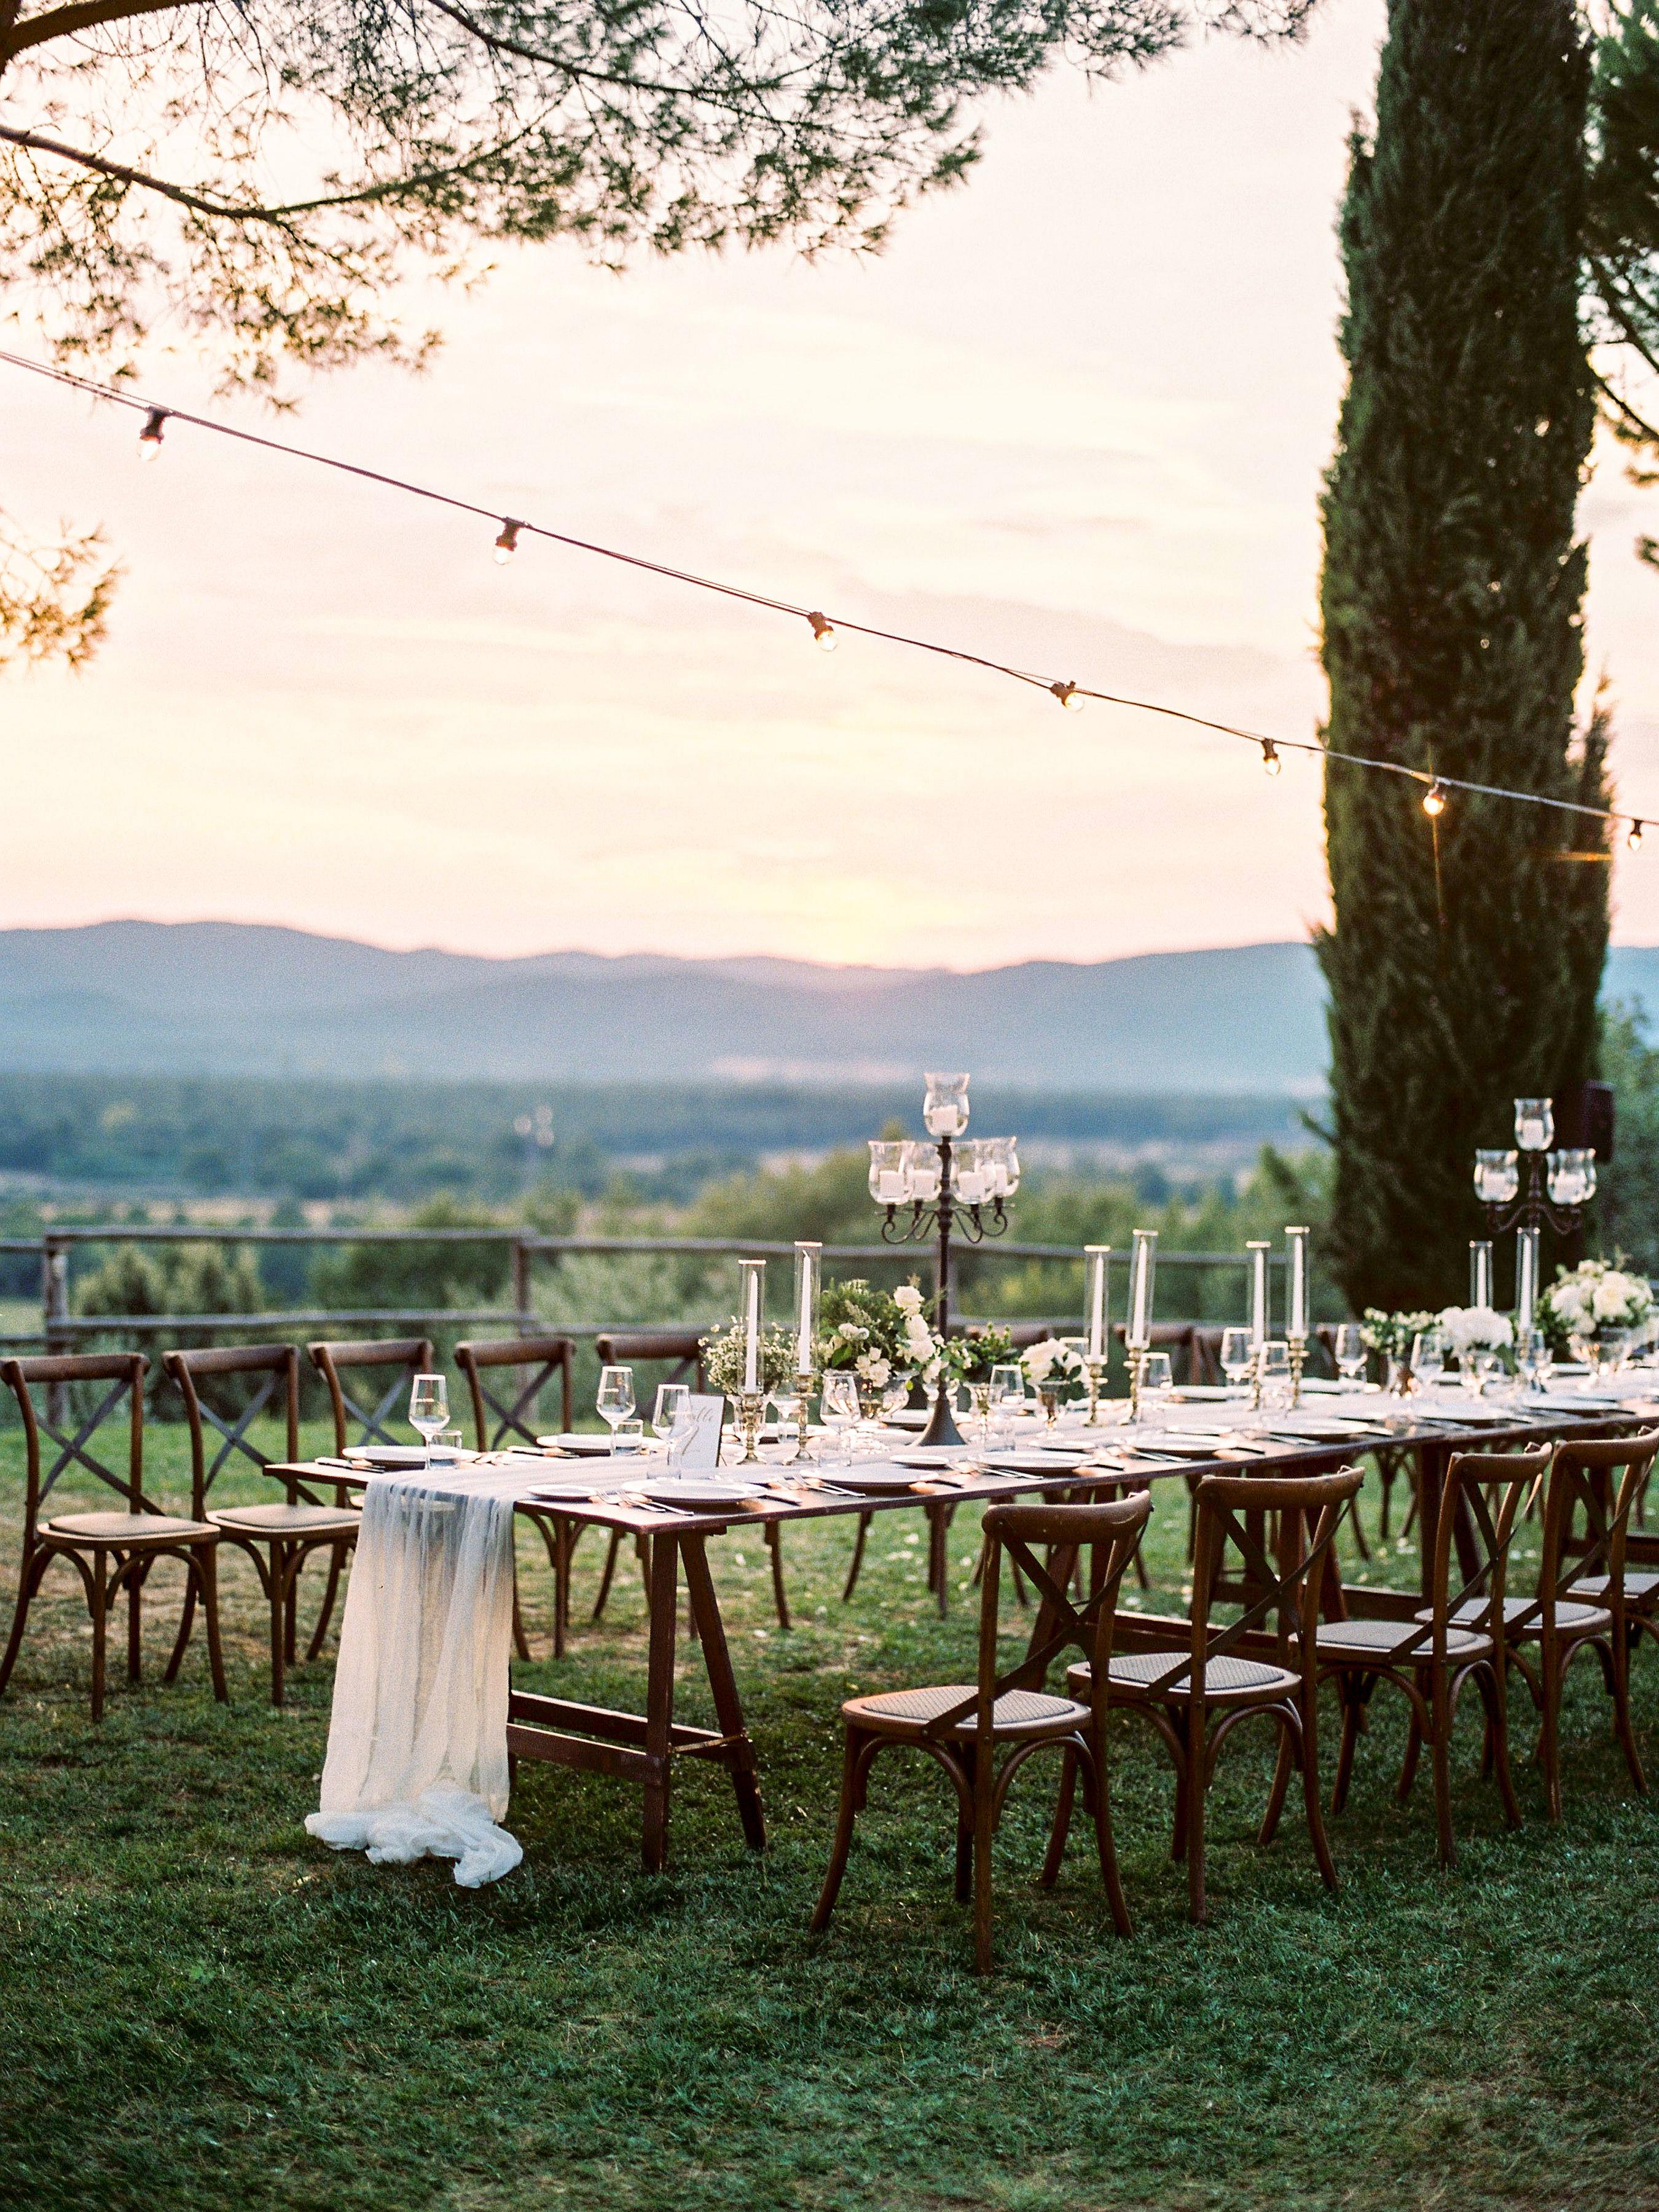 kseniya sadhir wedding reception tables outdoors